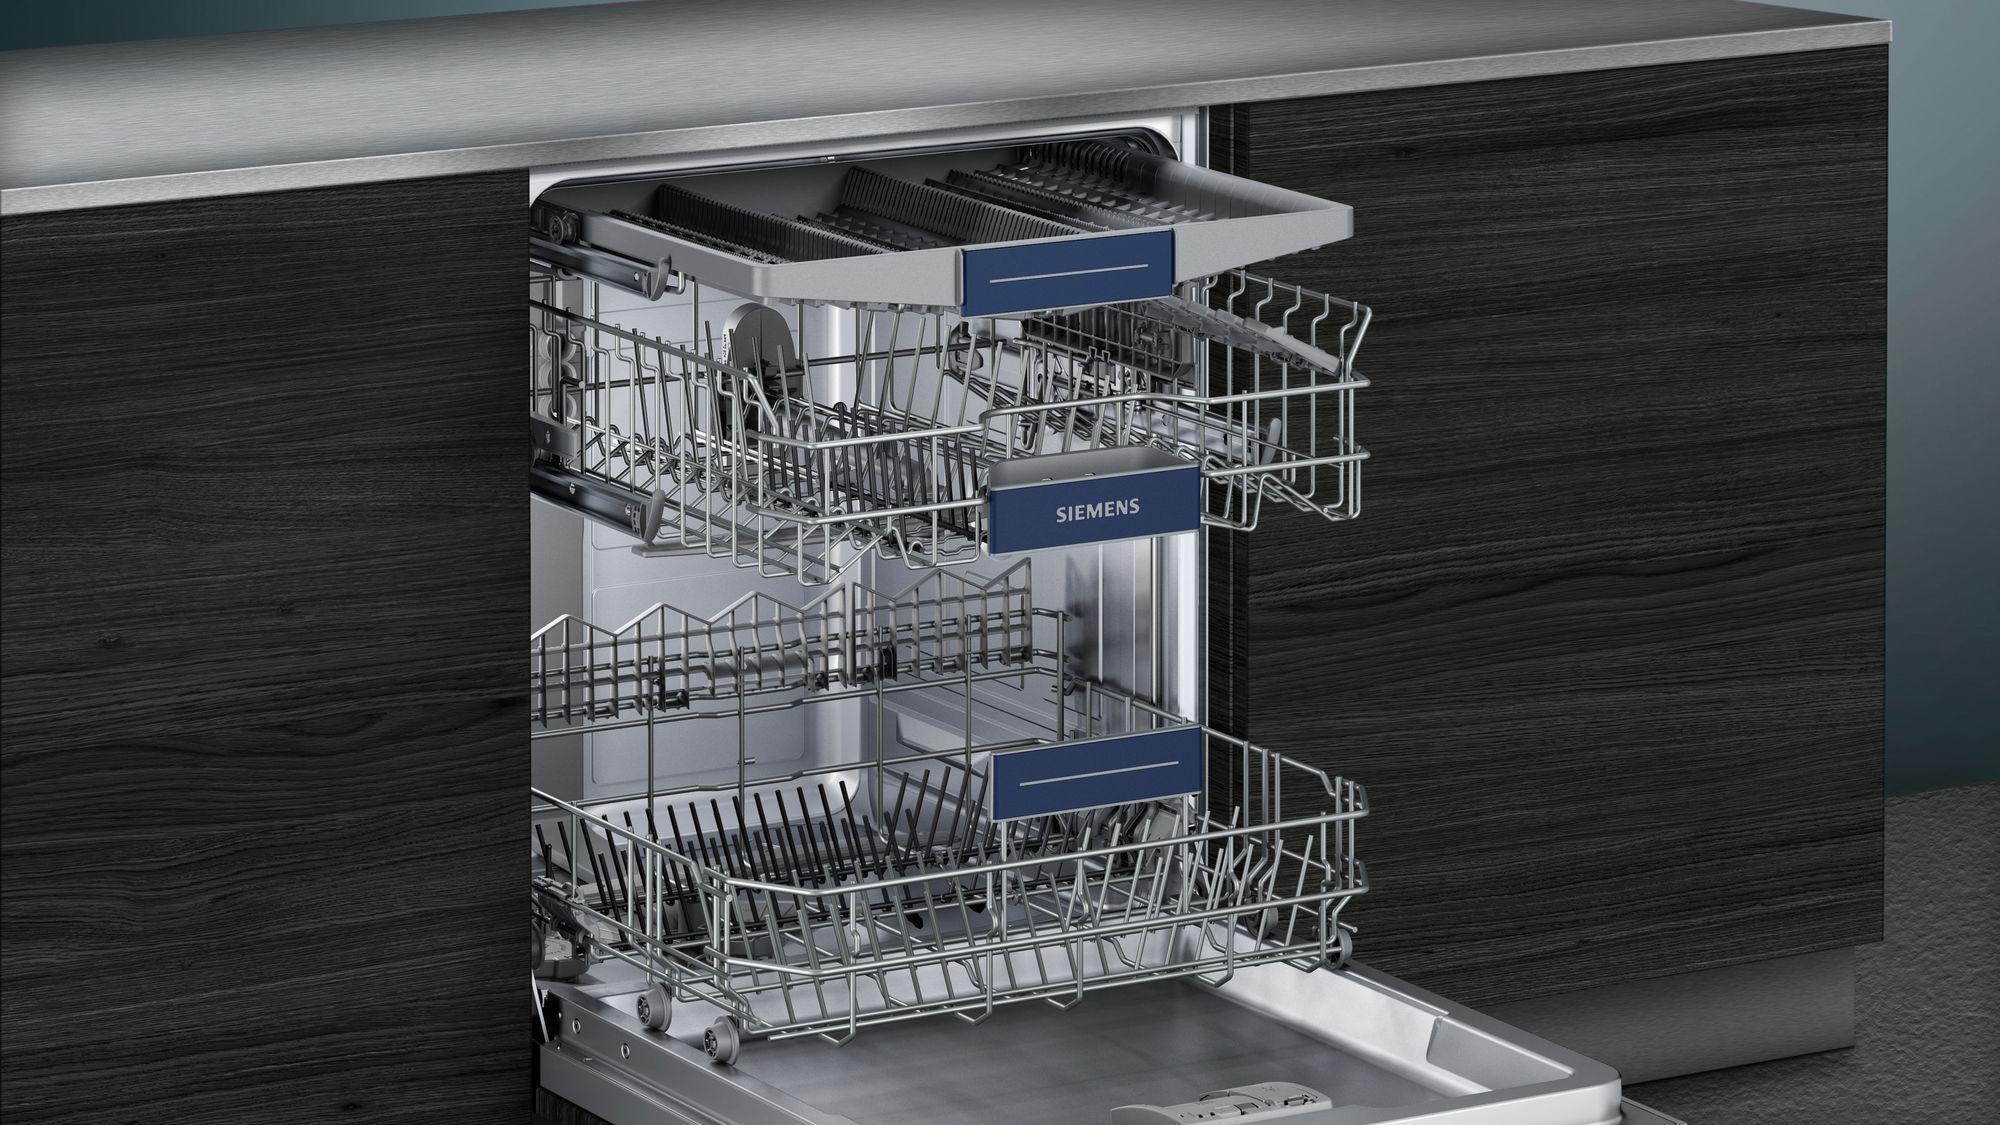 lave vaisselle int grable siemens sn558s09me electromenager grossiste. Black Bedroom Furniture Sets. Home Design Ideas